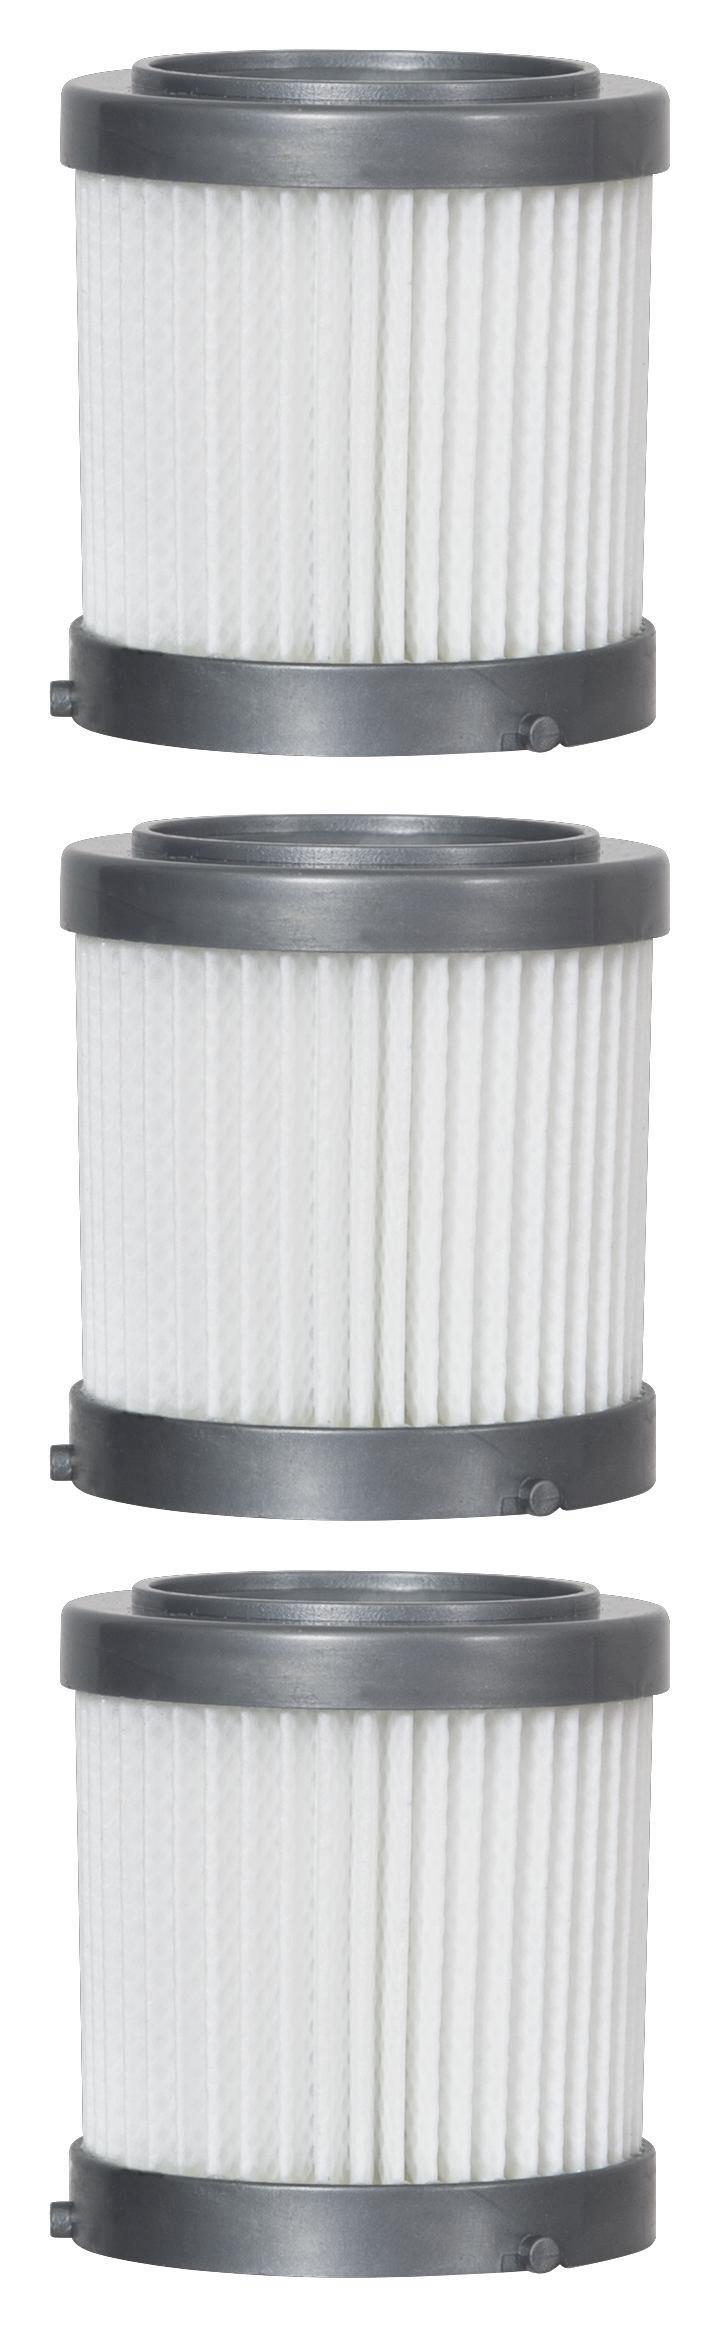 Bodenstaubsauger Livington Prime - Weiß, MODERN, Metall (123/22/16cm) - MEDIASHOP